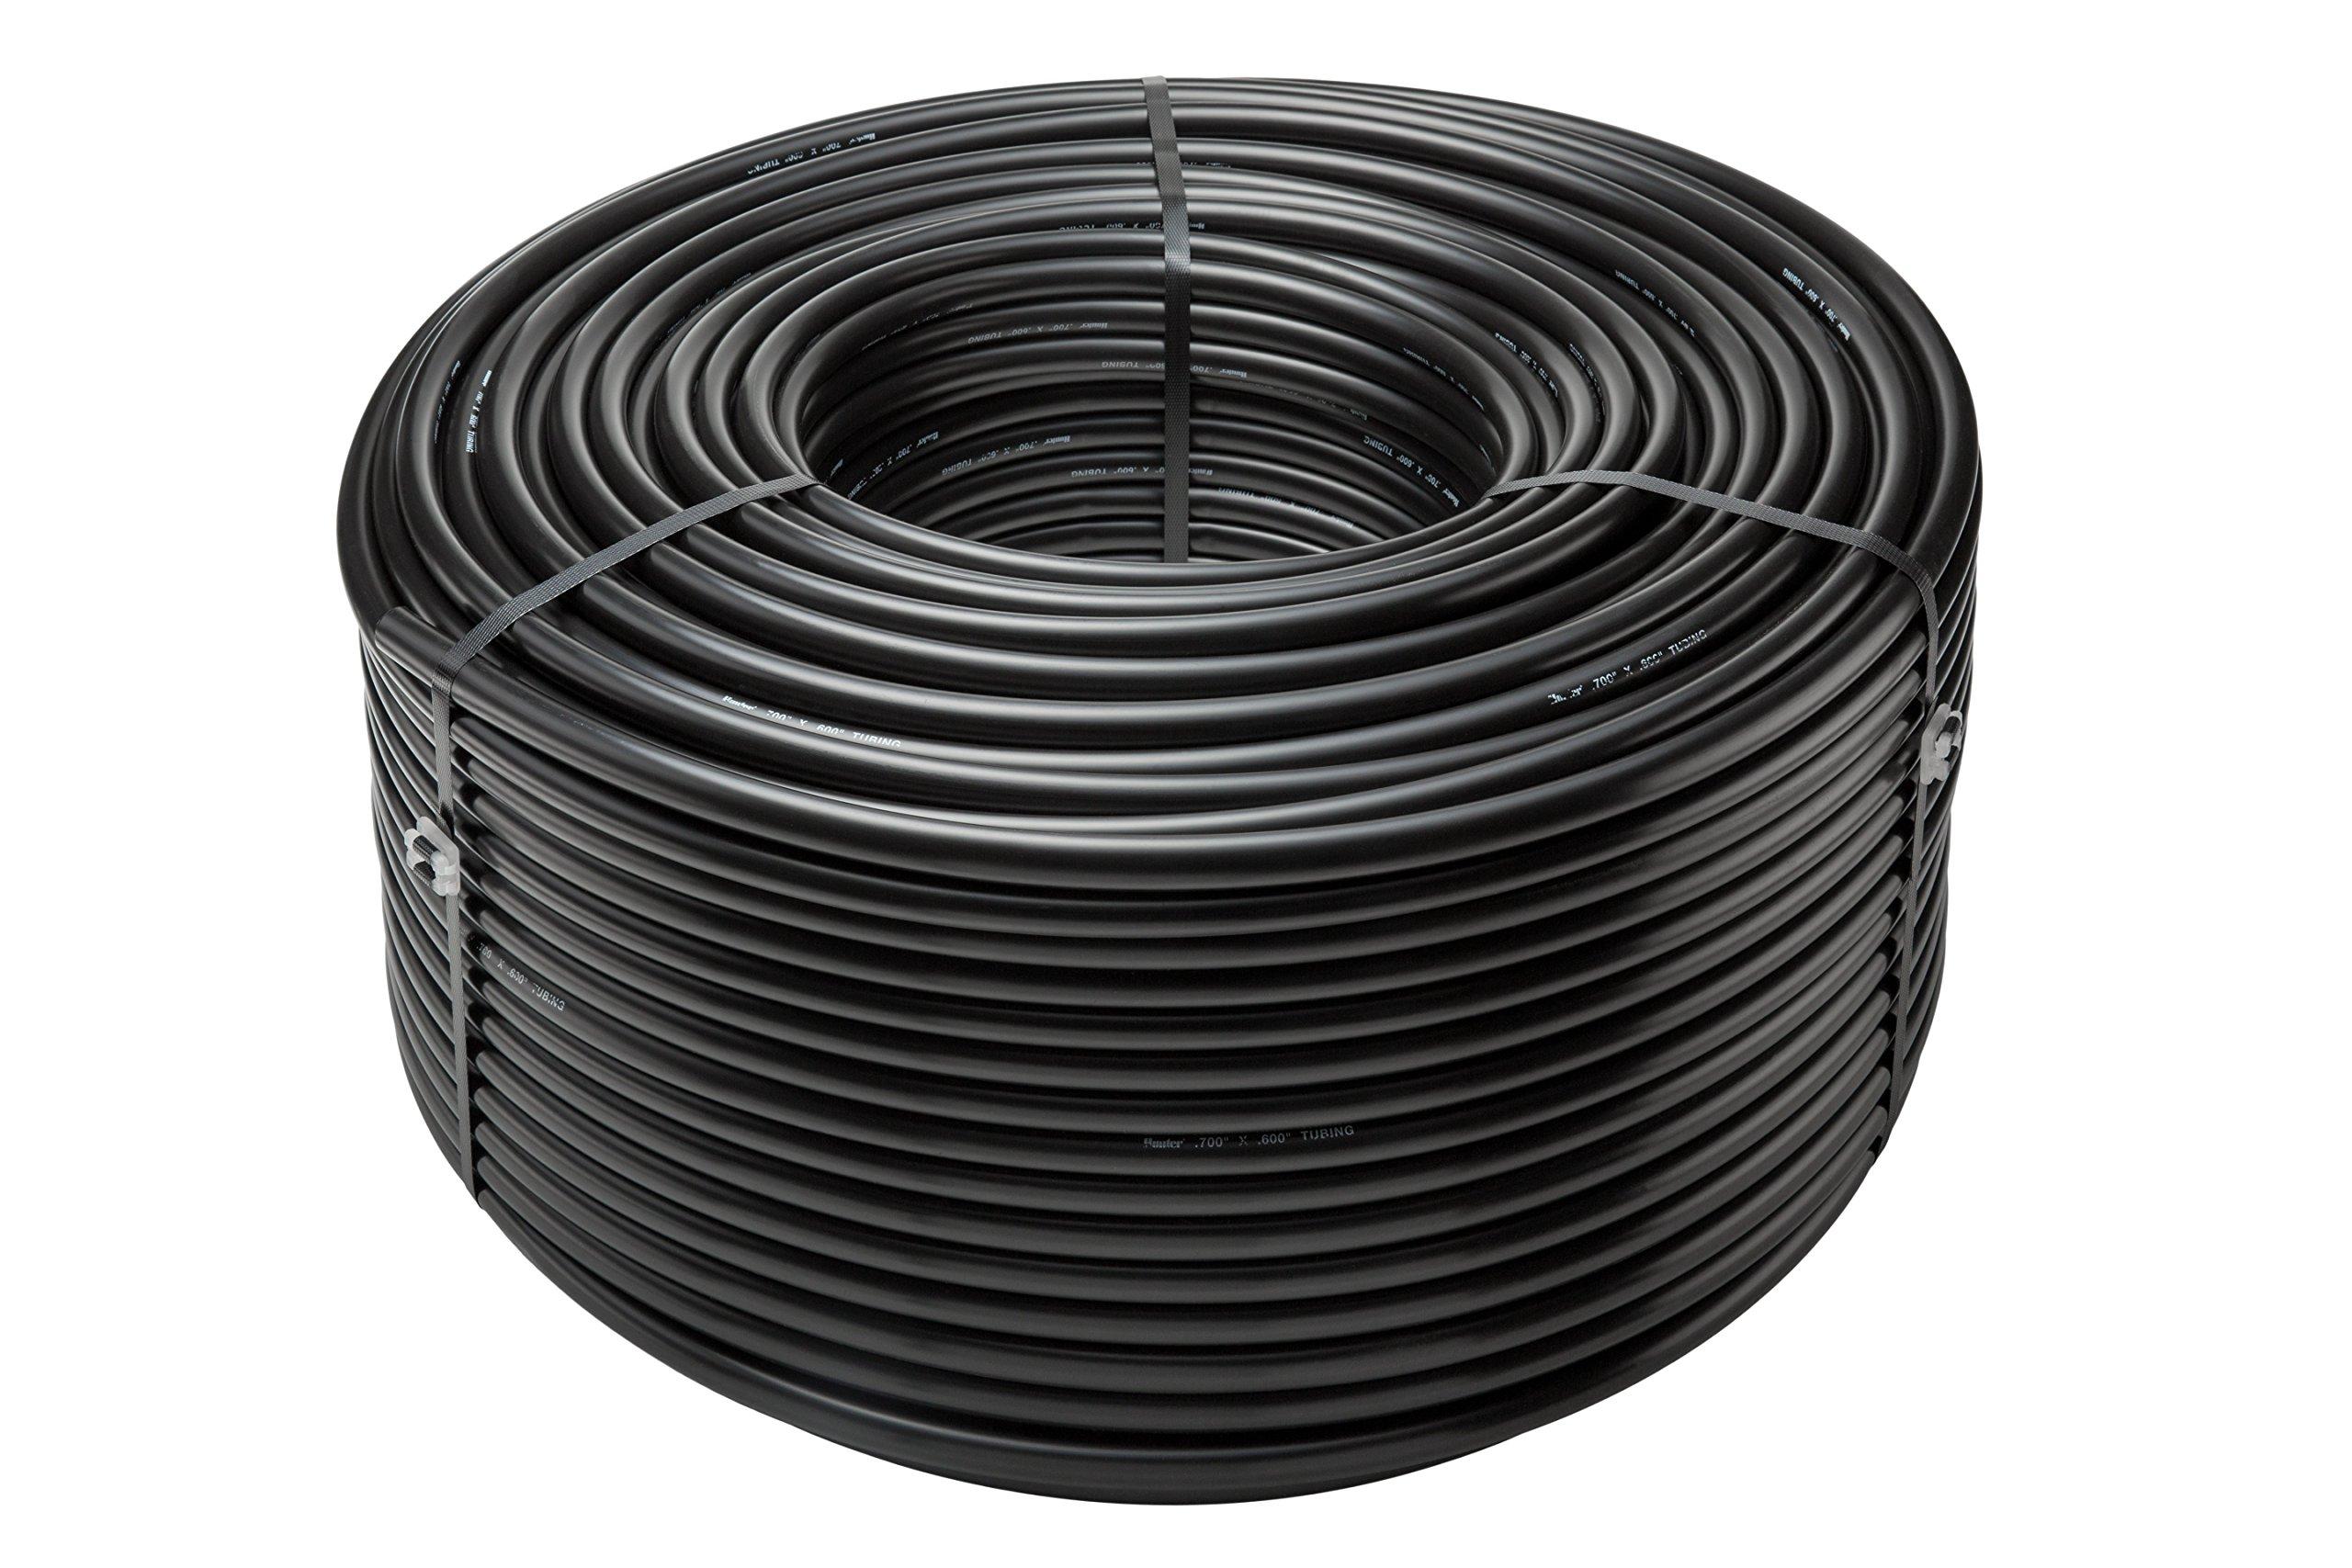 Hunter TWPE-700-1K 1/2'' Polyethylene Tube, 1000' by Hunter